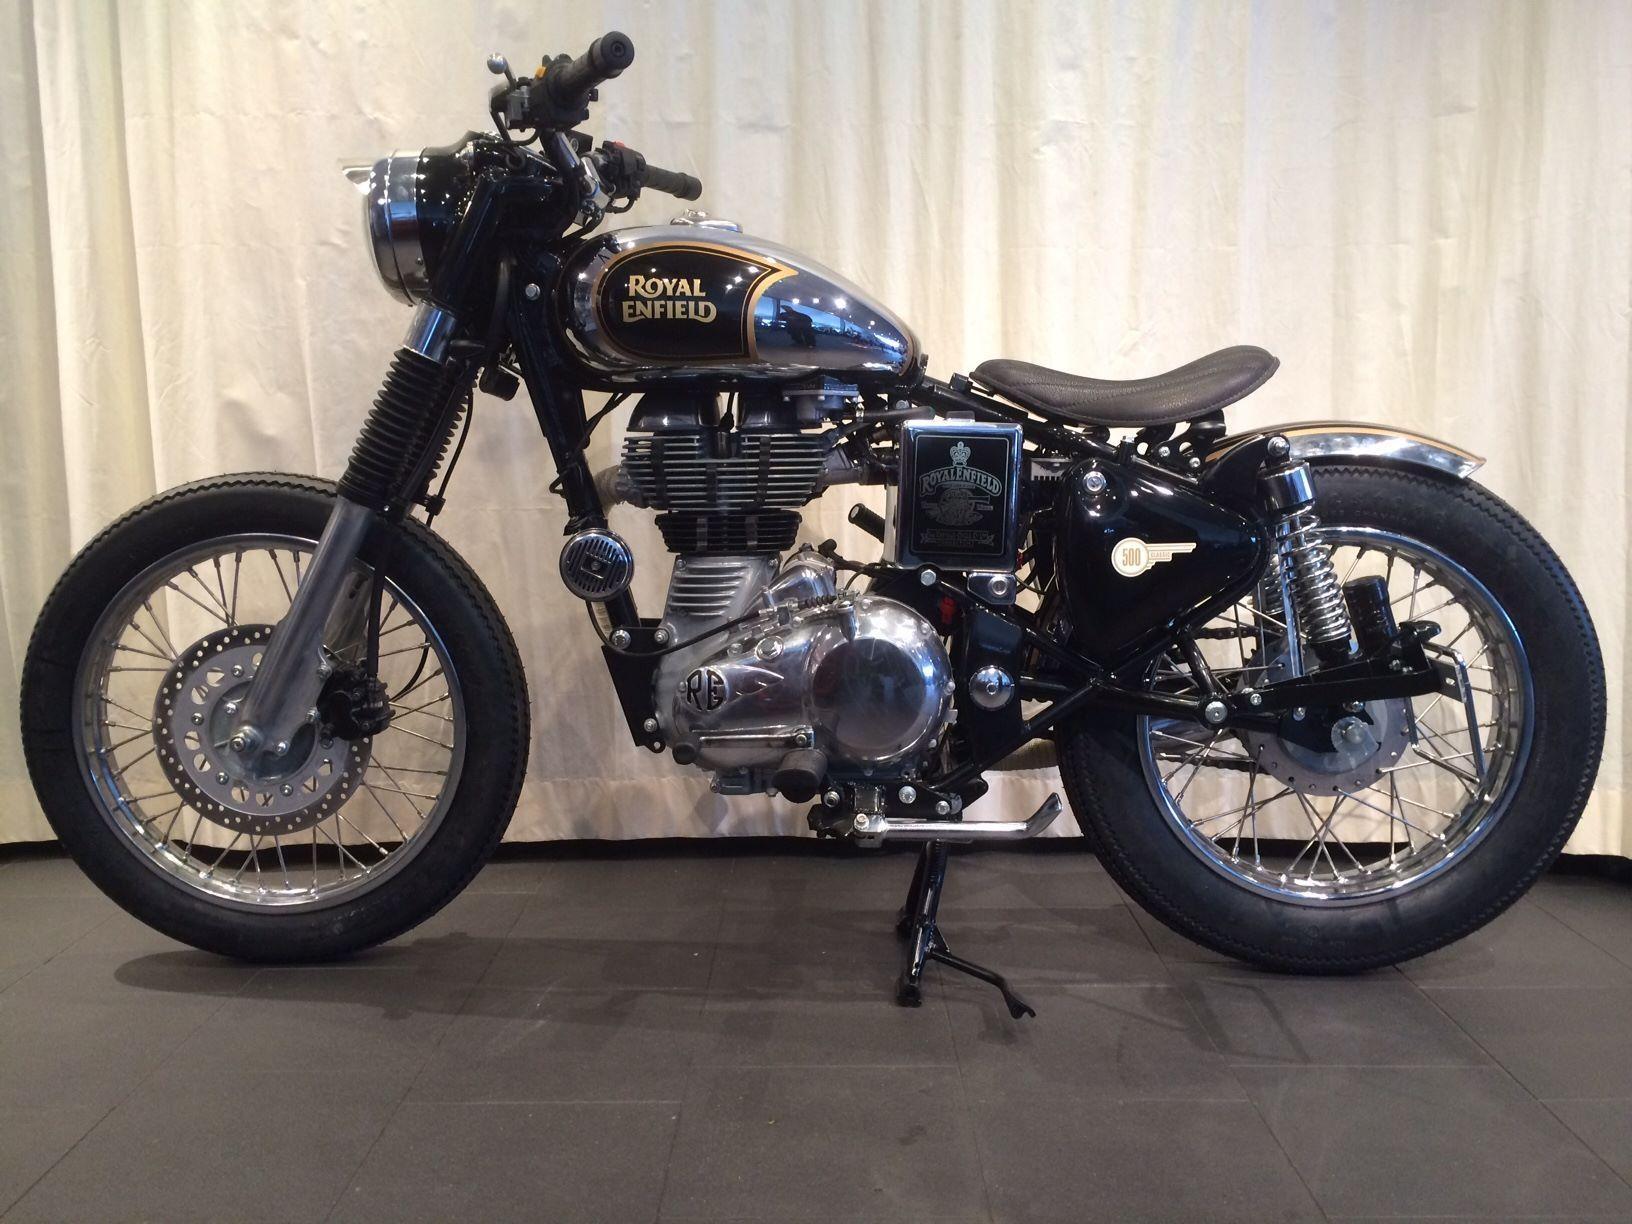 moto veicoli nuovi acquistare royal enfield classic 500 efi bobber egli motorradtechnik ag bettwil. Black Bedroom Furniture Sets. Home Design Ideas